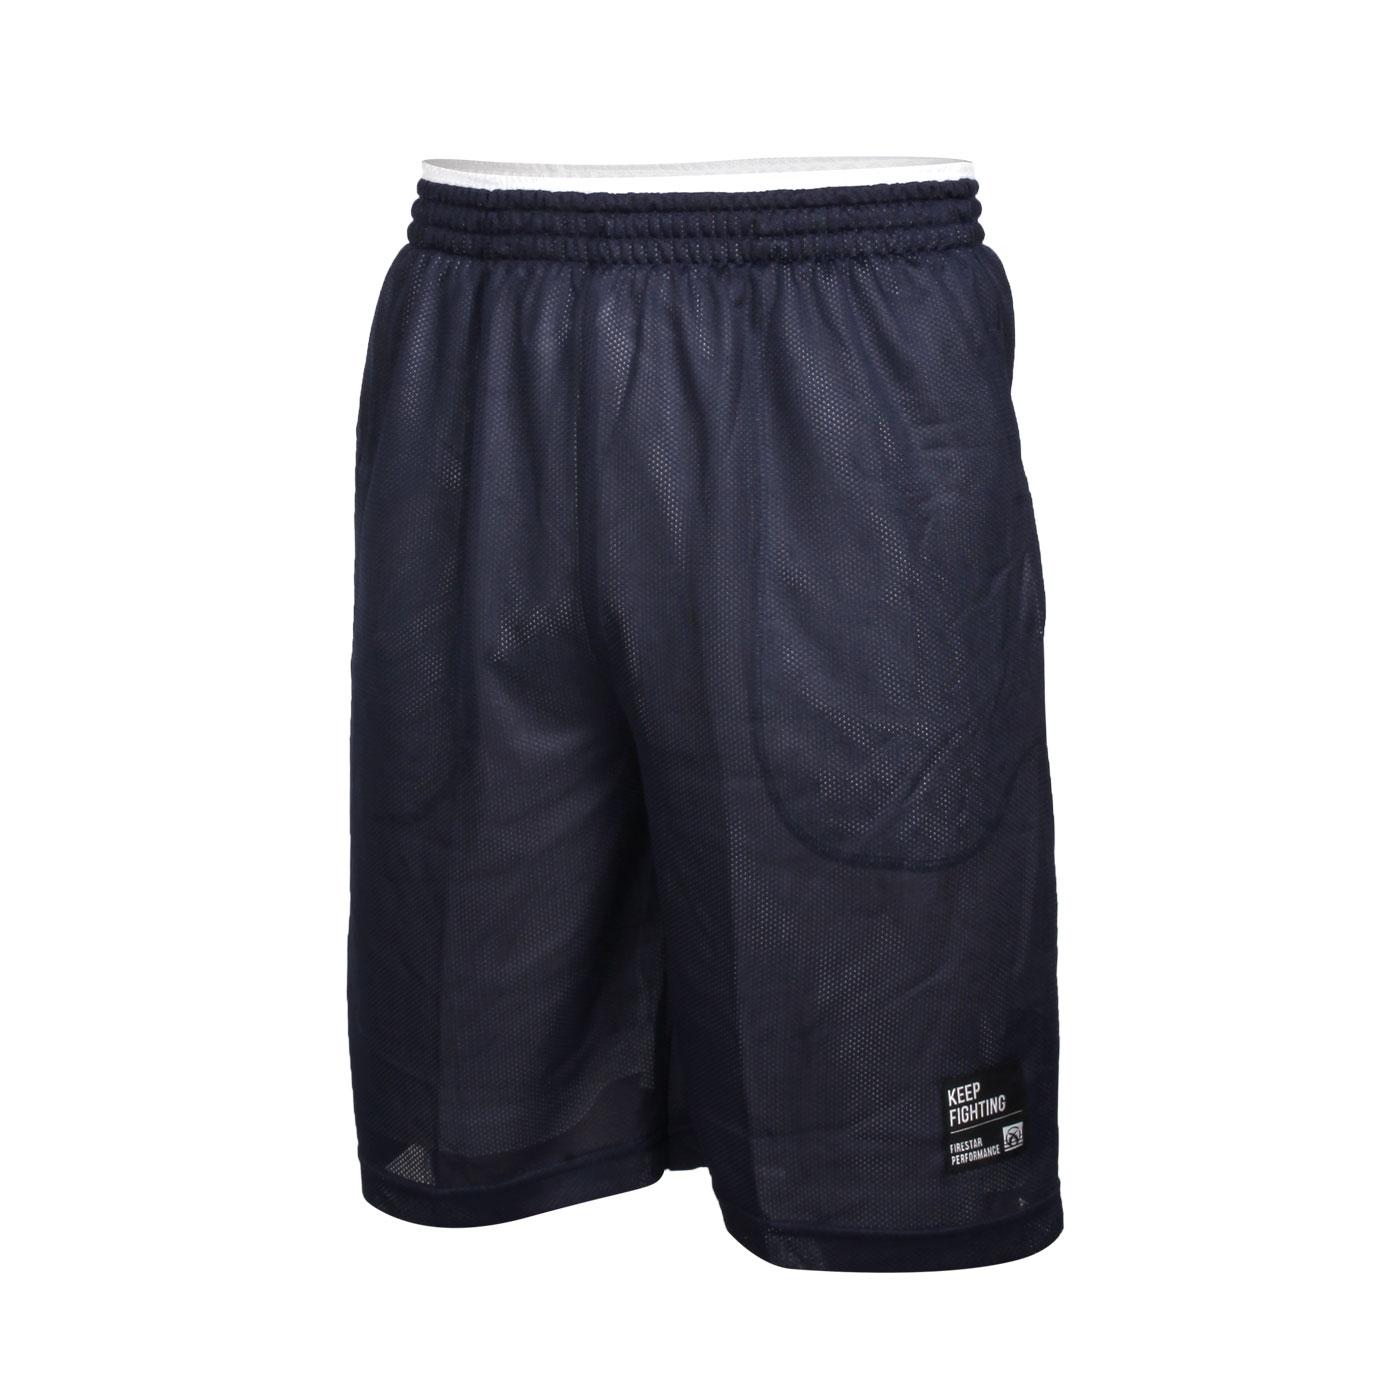 FIRESTAR 男款雙面訓練籃球短褲 B1706-93 - 丈青白